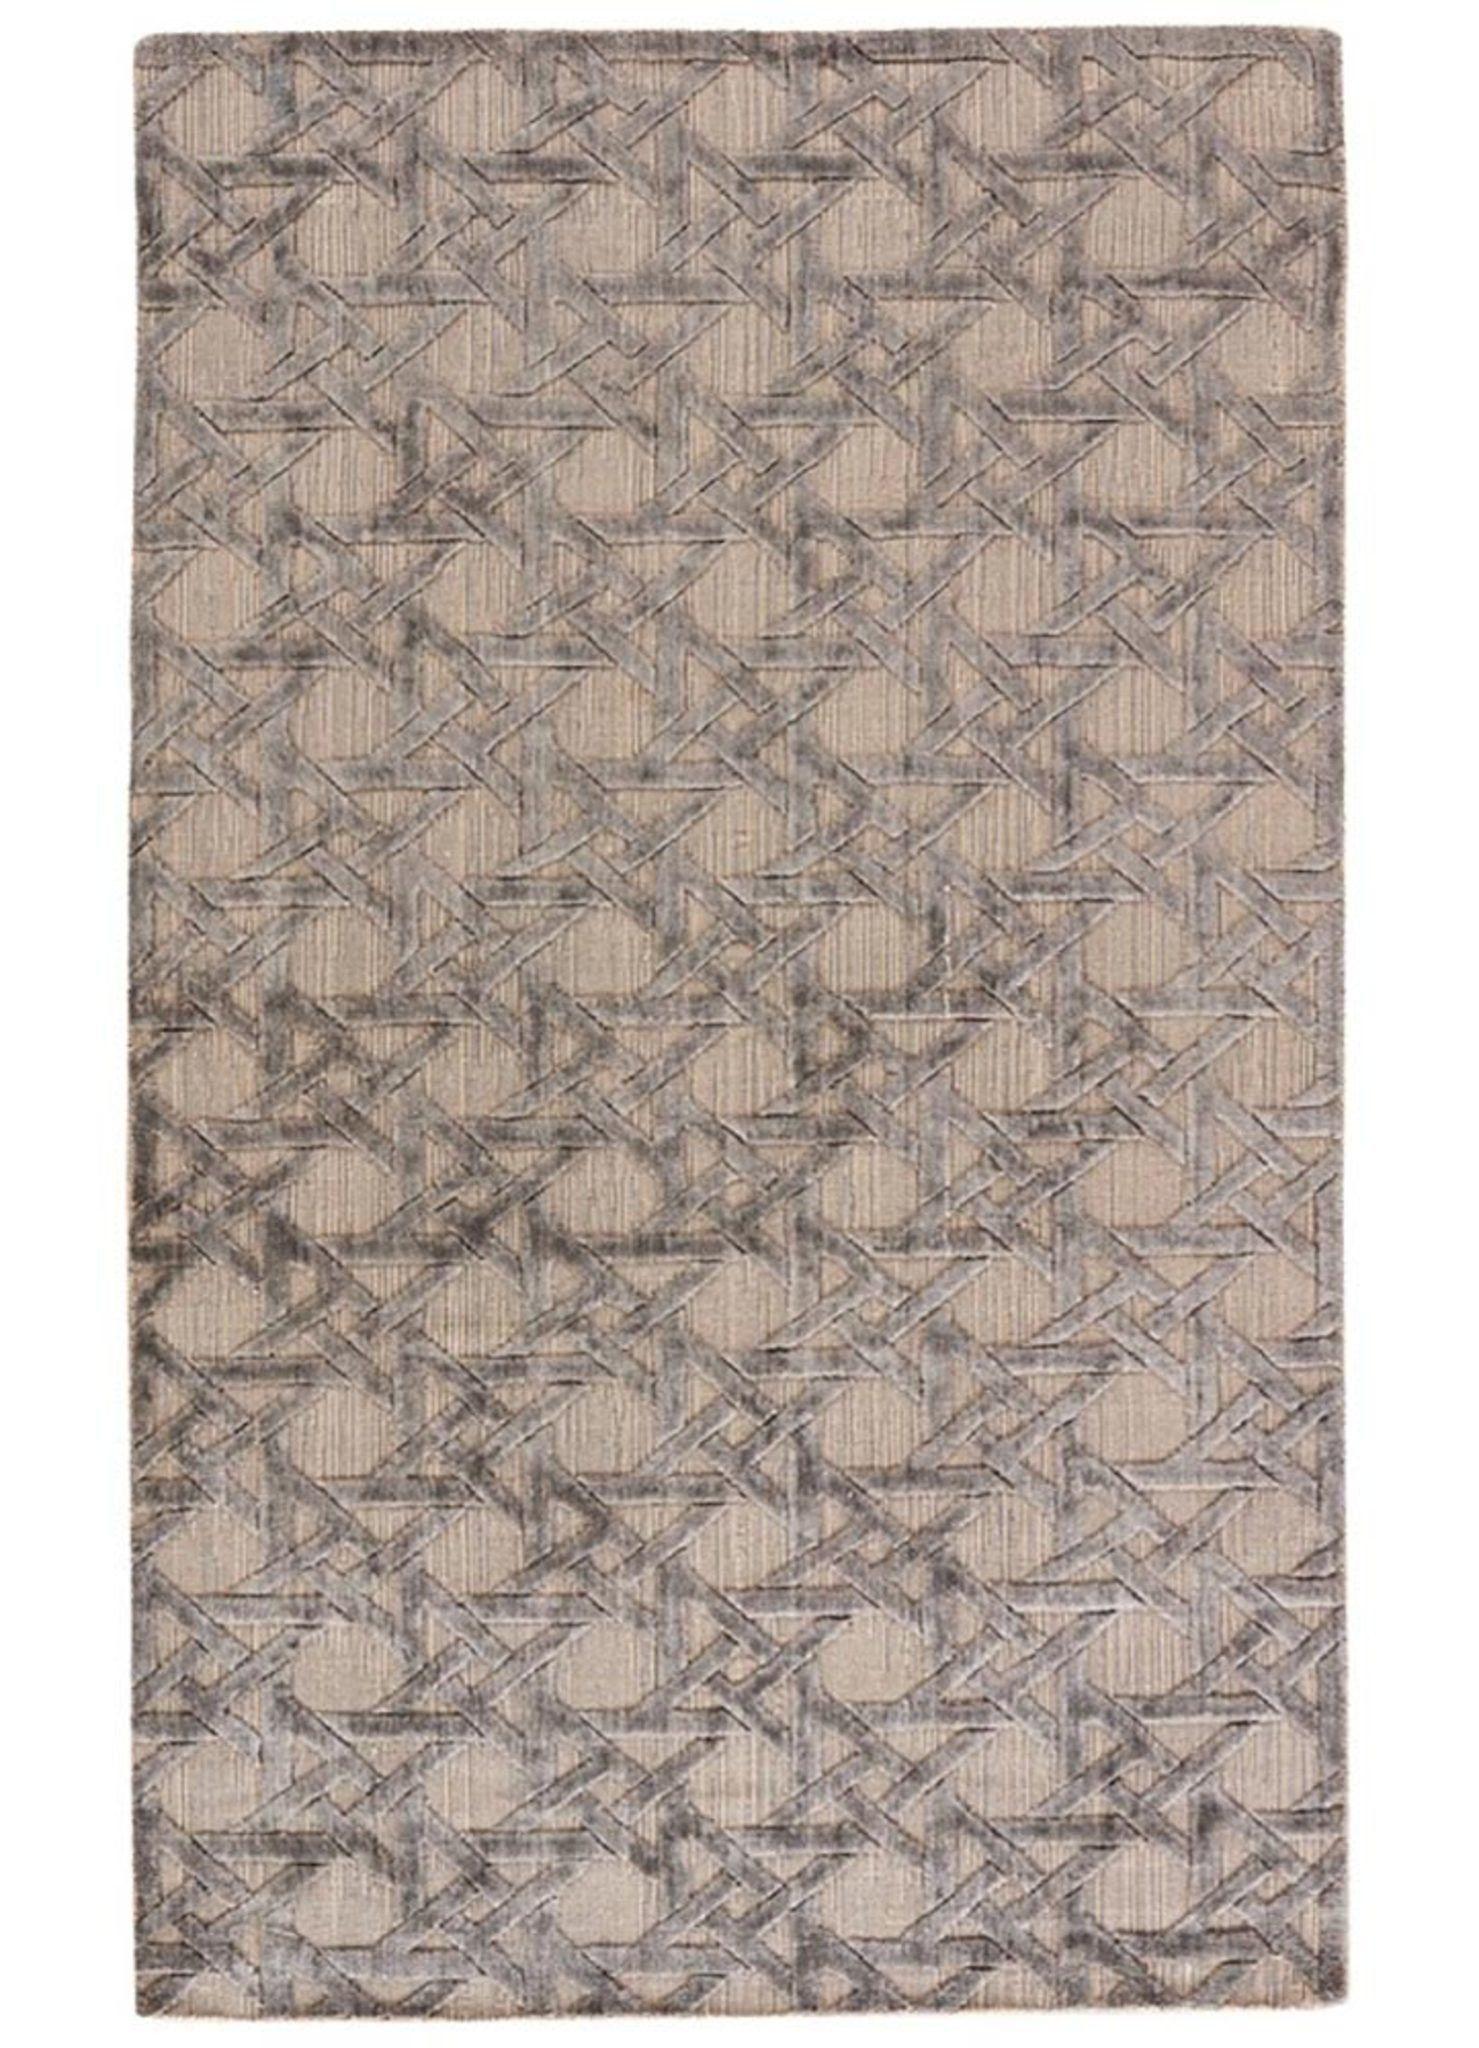 Solids Handloom Phwv 24 Dark Ivory Charcoal Slate Wool And Viscose Rug